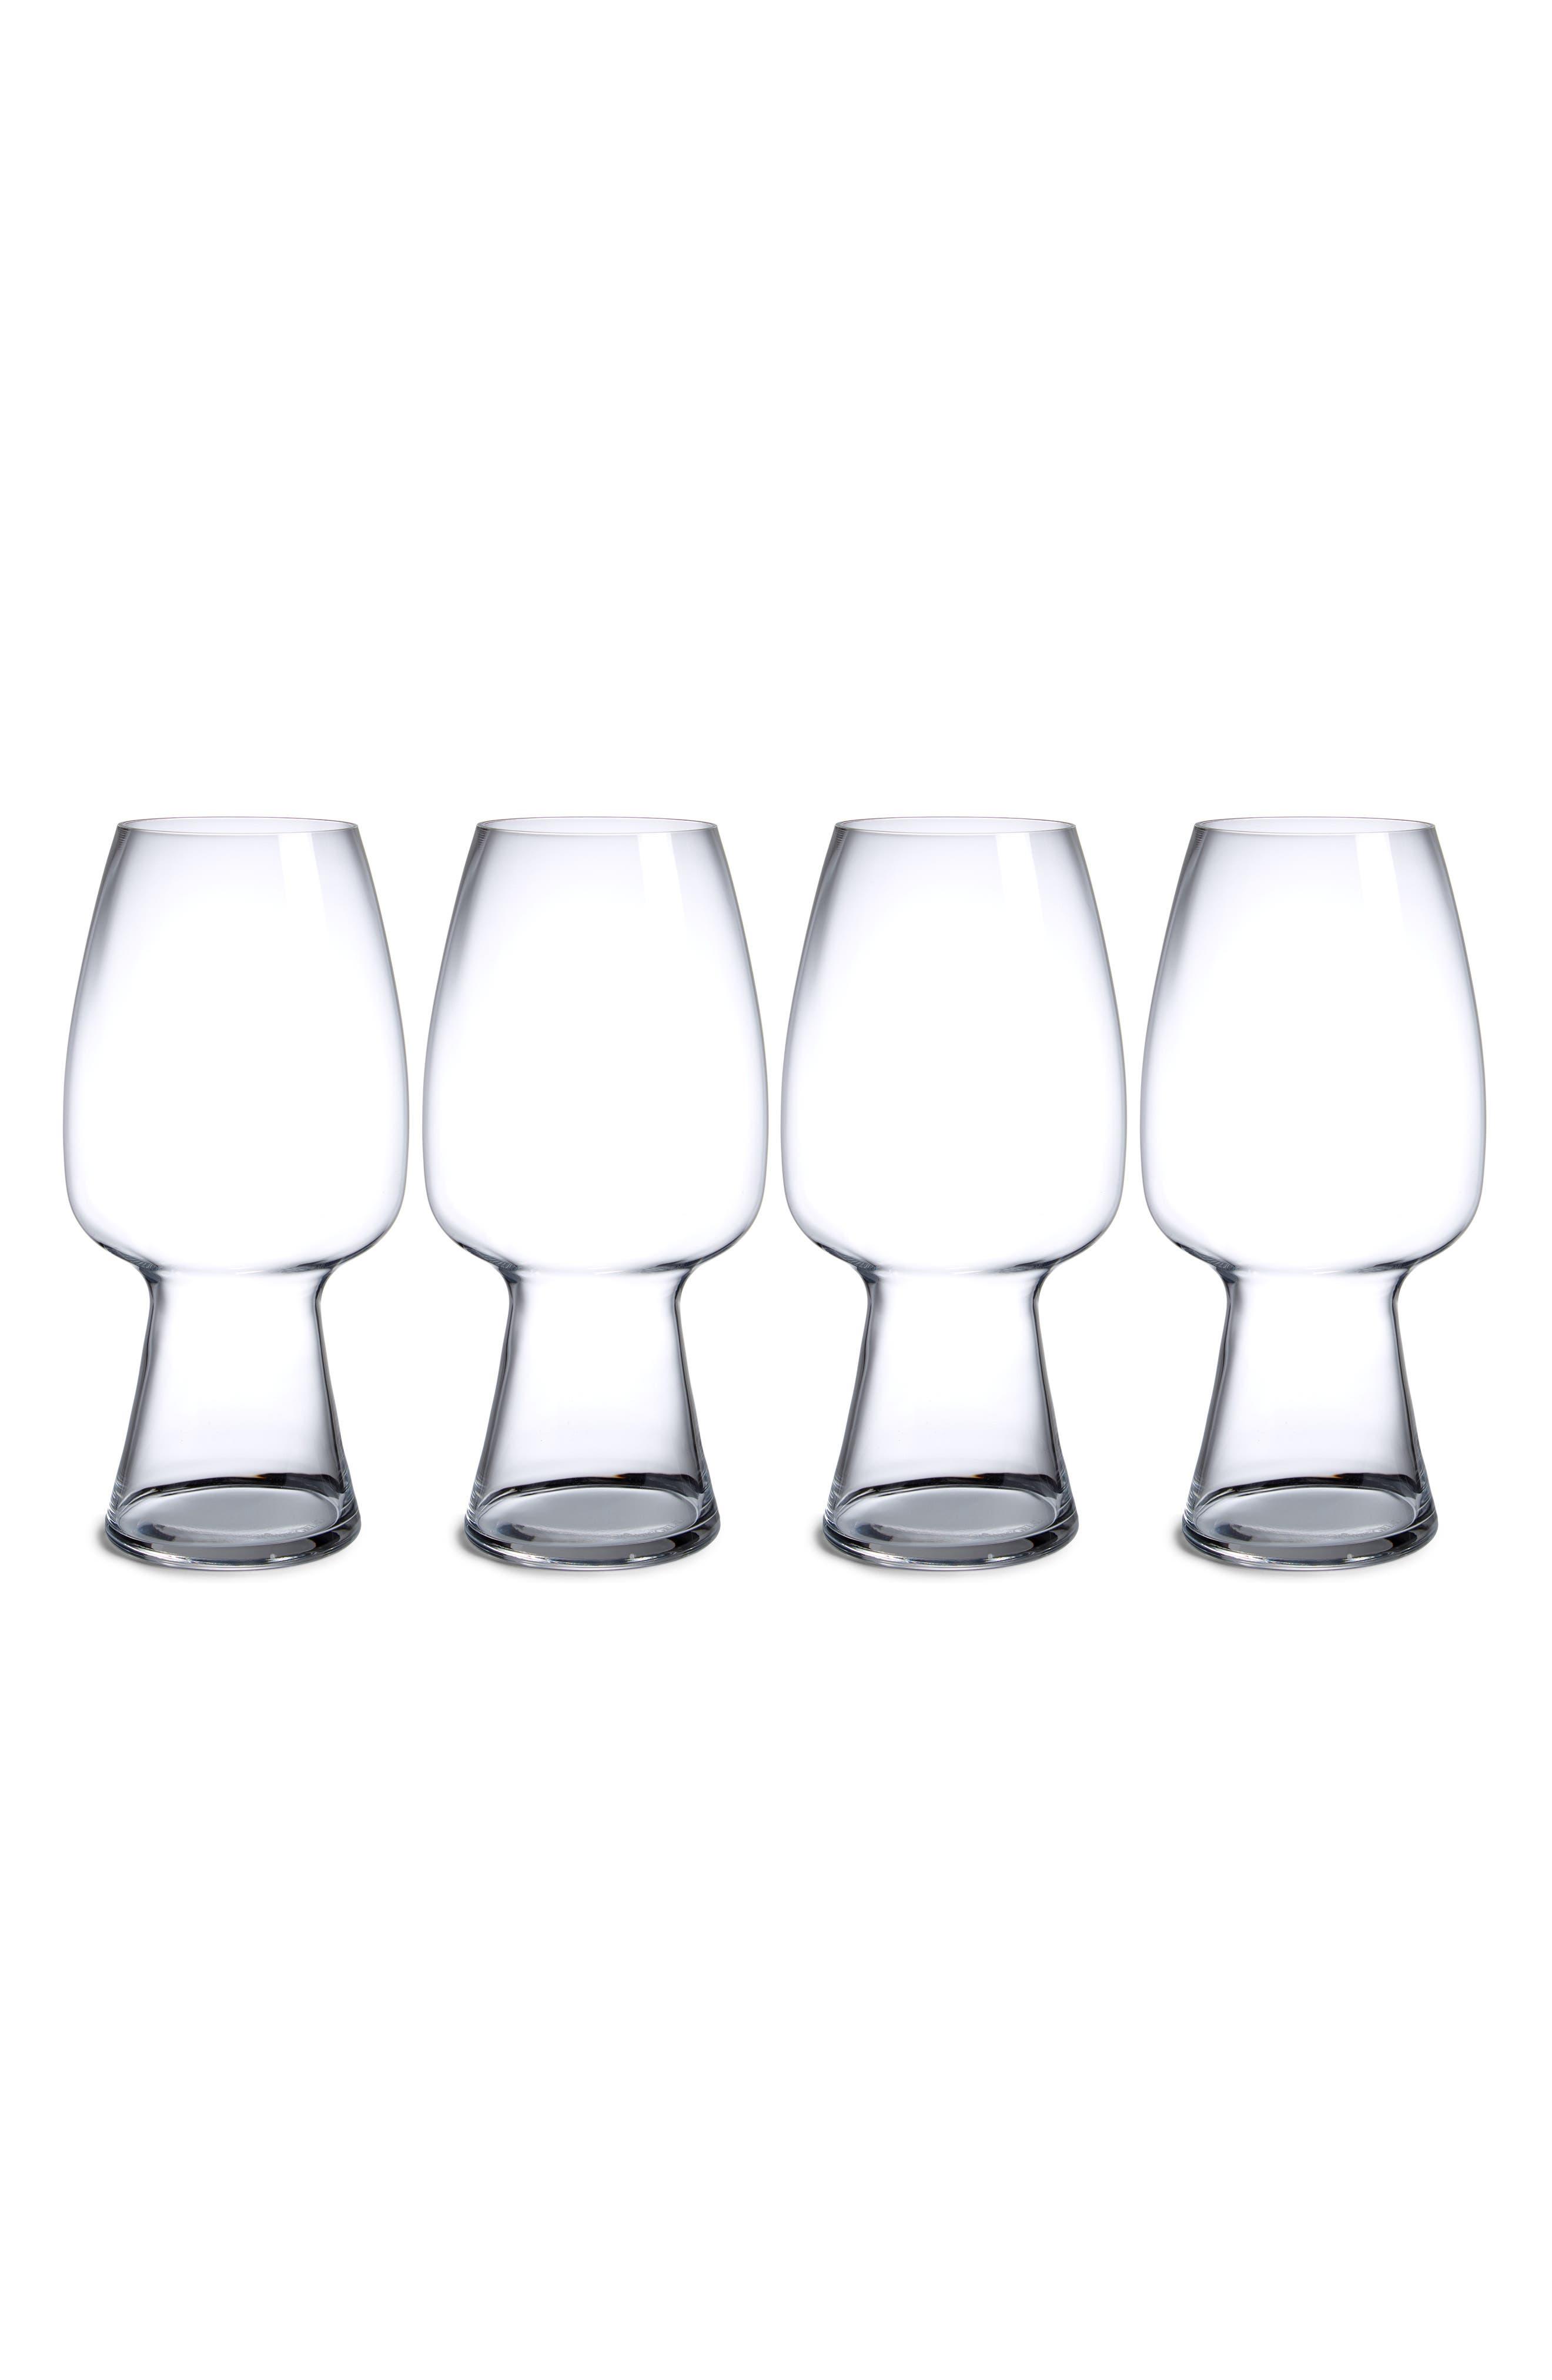 Set of 4 Stout Glasses,                             Main thumbnail 1, color,                             Clear